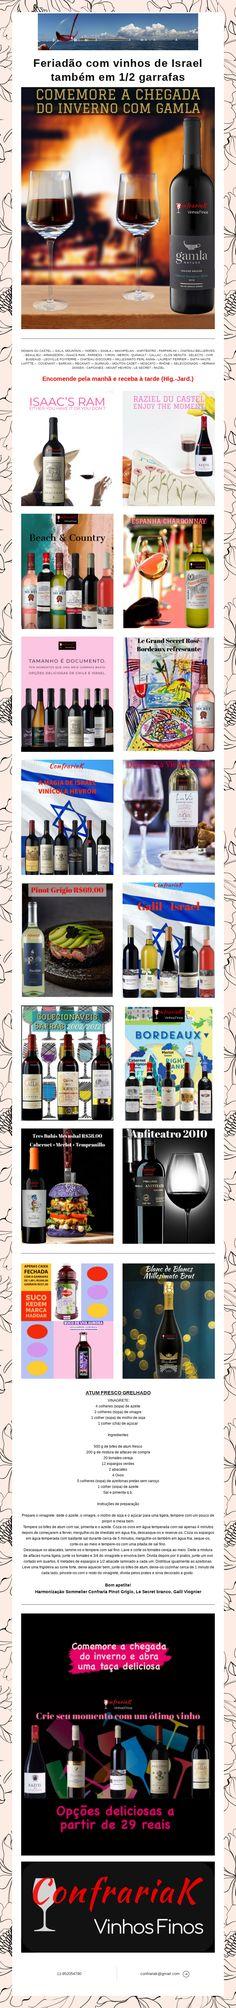 Mouton Cadet, Laurent Perrier, 1, Holiday, Wine Pairings, Bottles